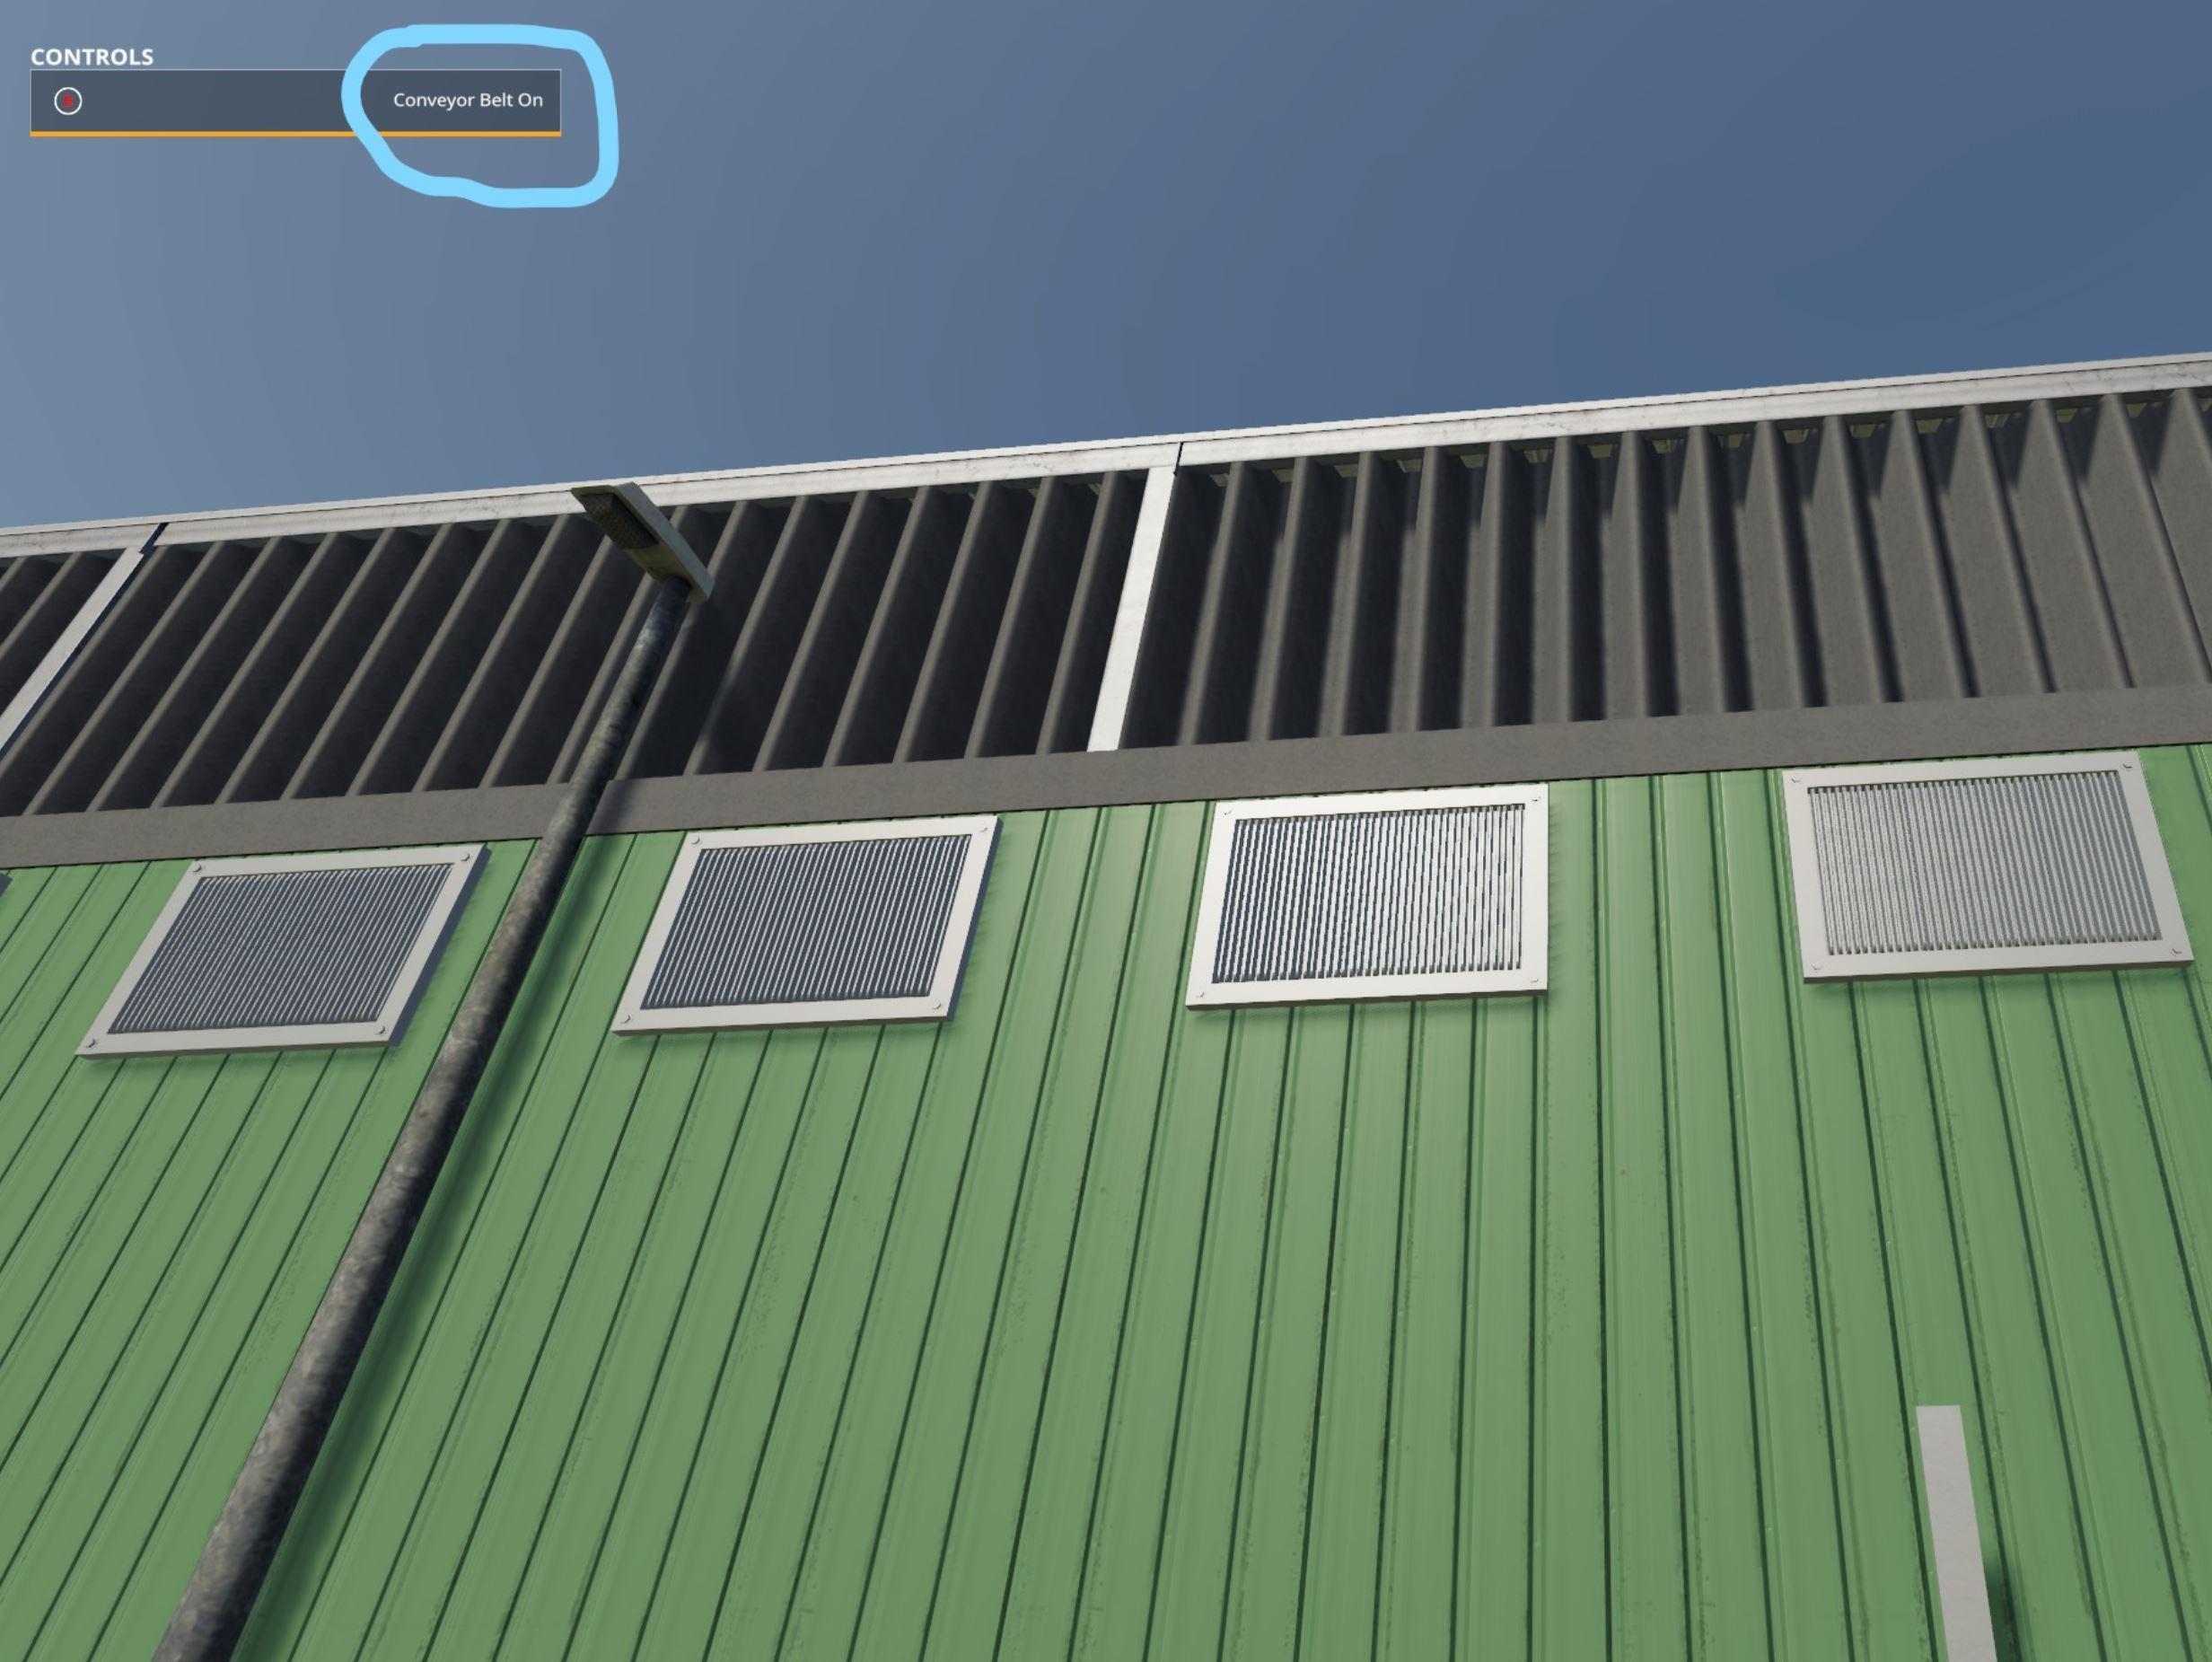 SYSTEM-TEC Grass Dryer (English Version) v 1 0 | FS19 mods, Farming